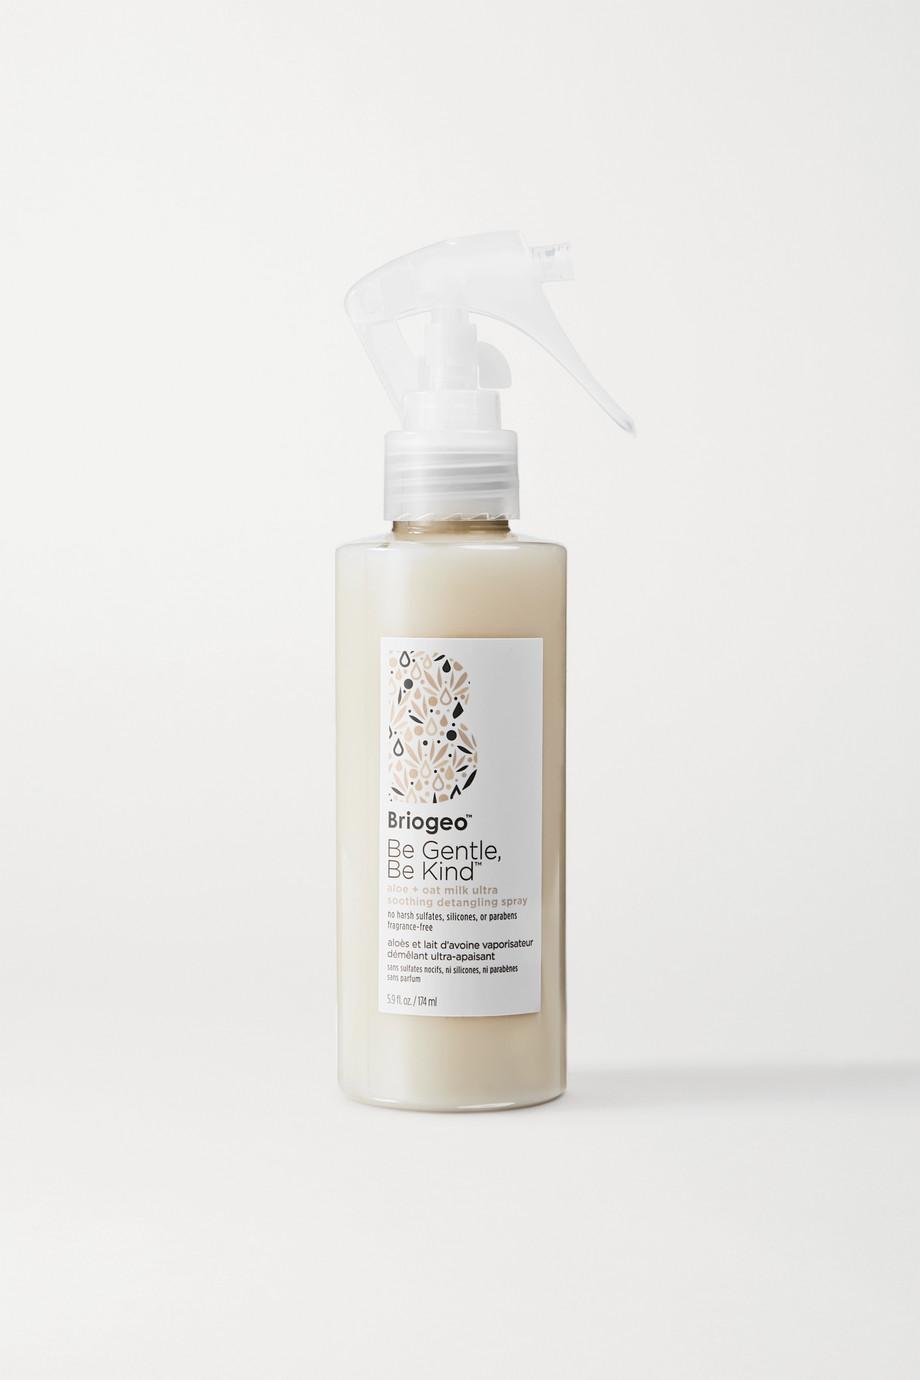 Briogeo Be Gentle, Be Kind Aloe + Oat Milk Ultra Soothing Detangling Spray, 174ml